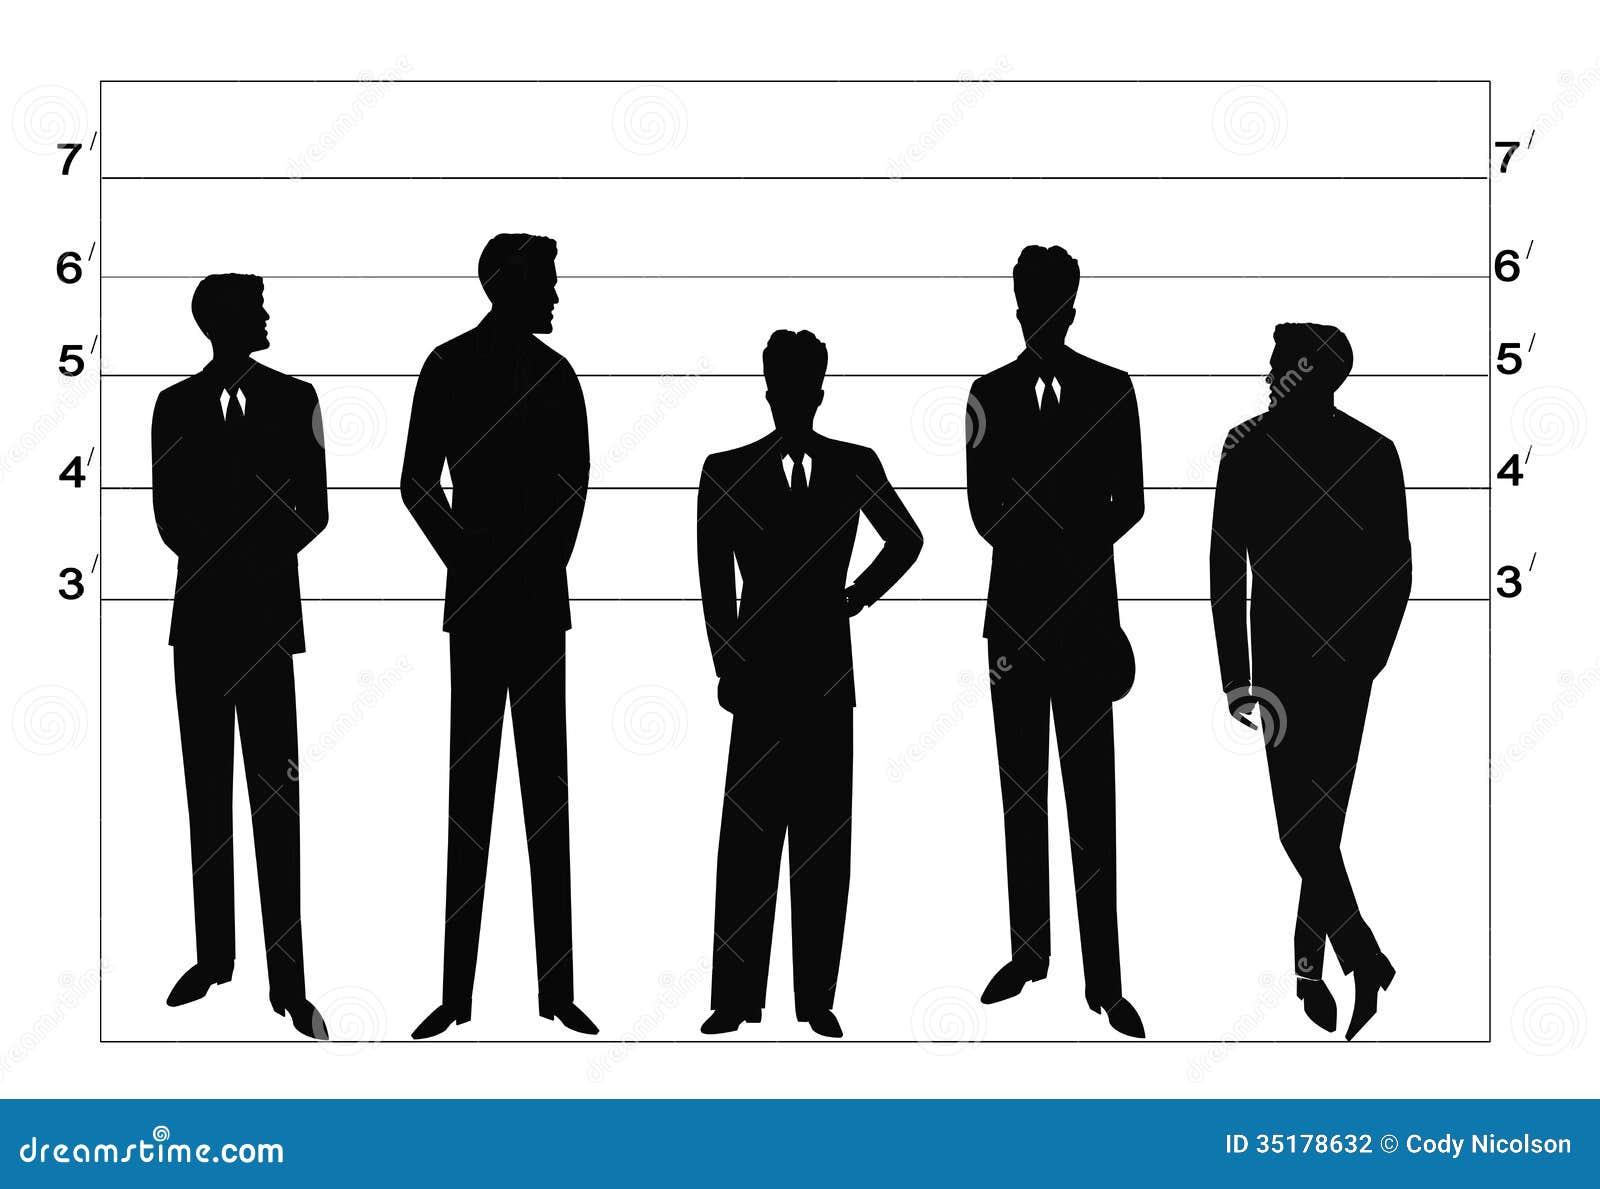 Police Line - Police Line